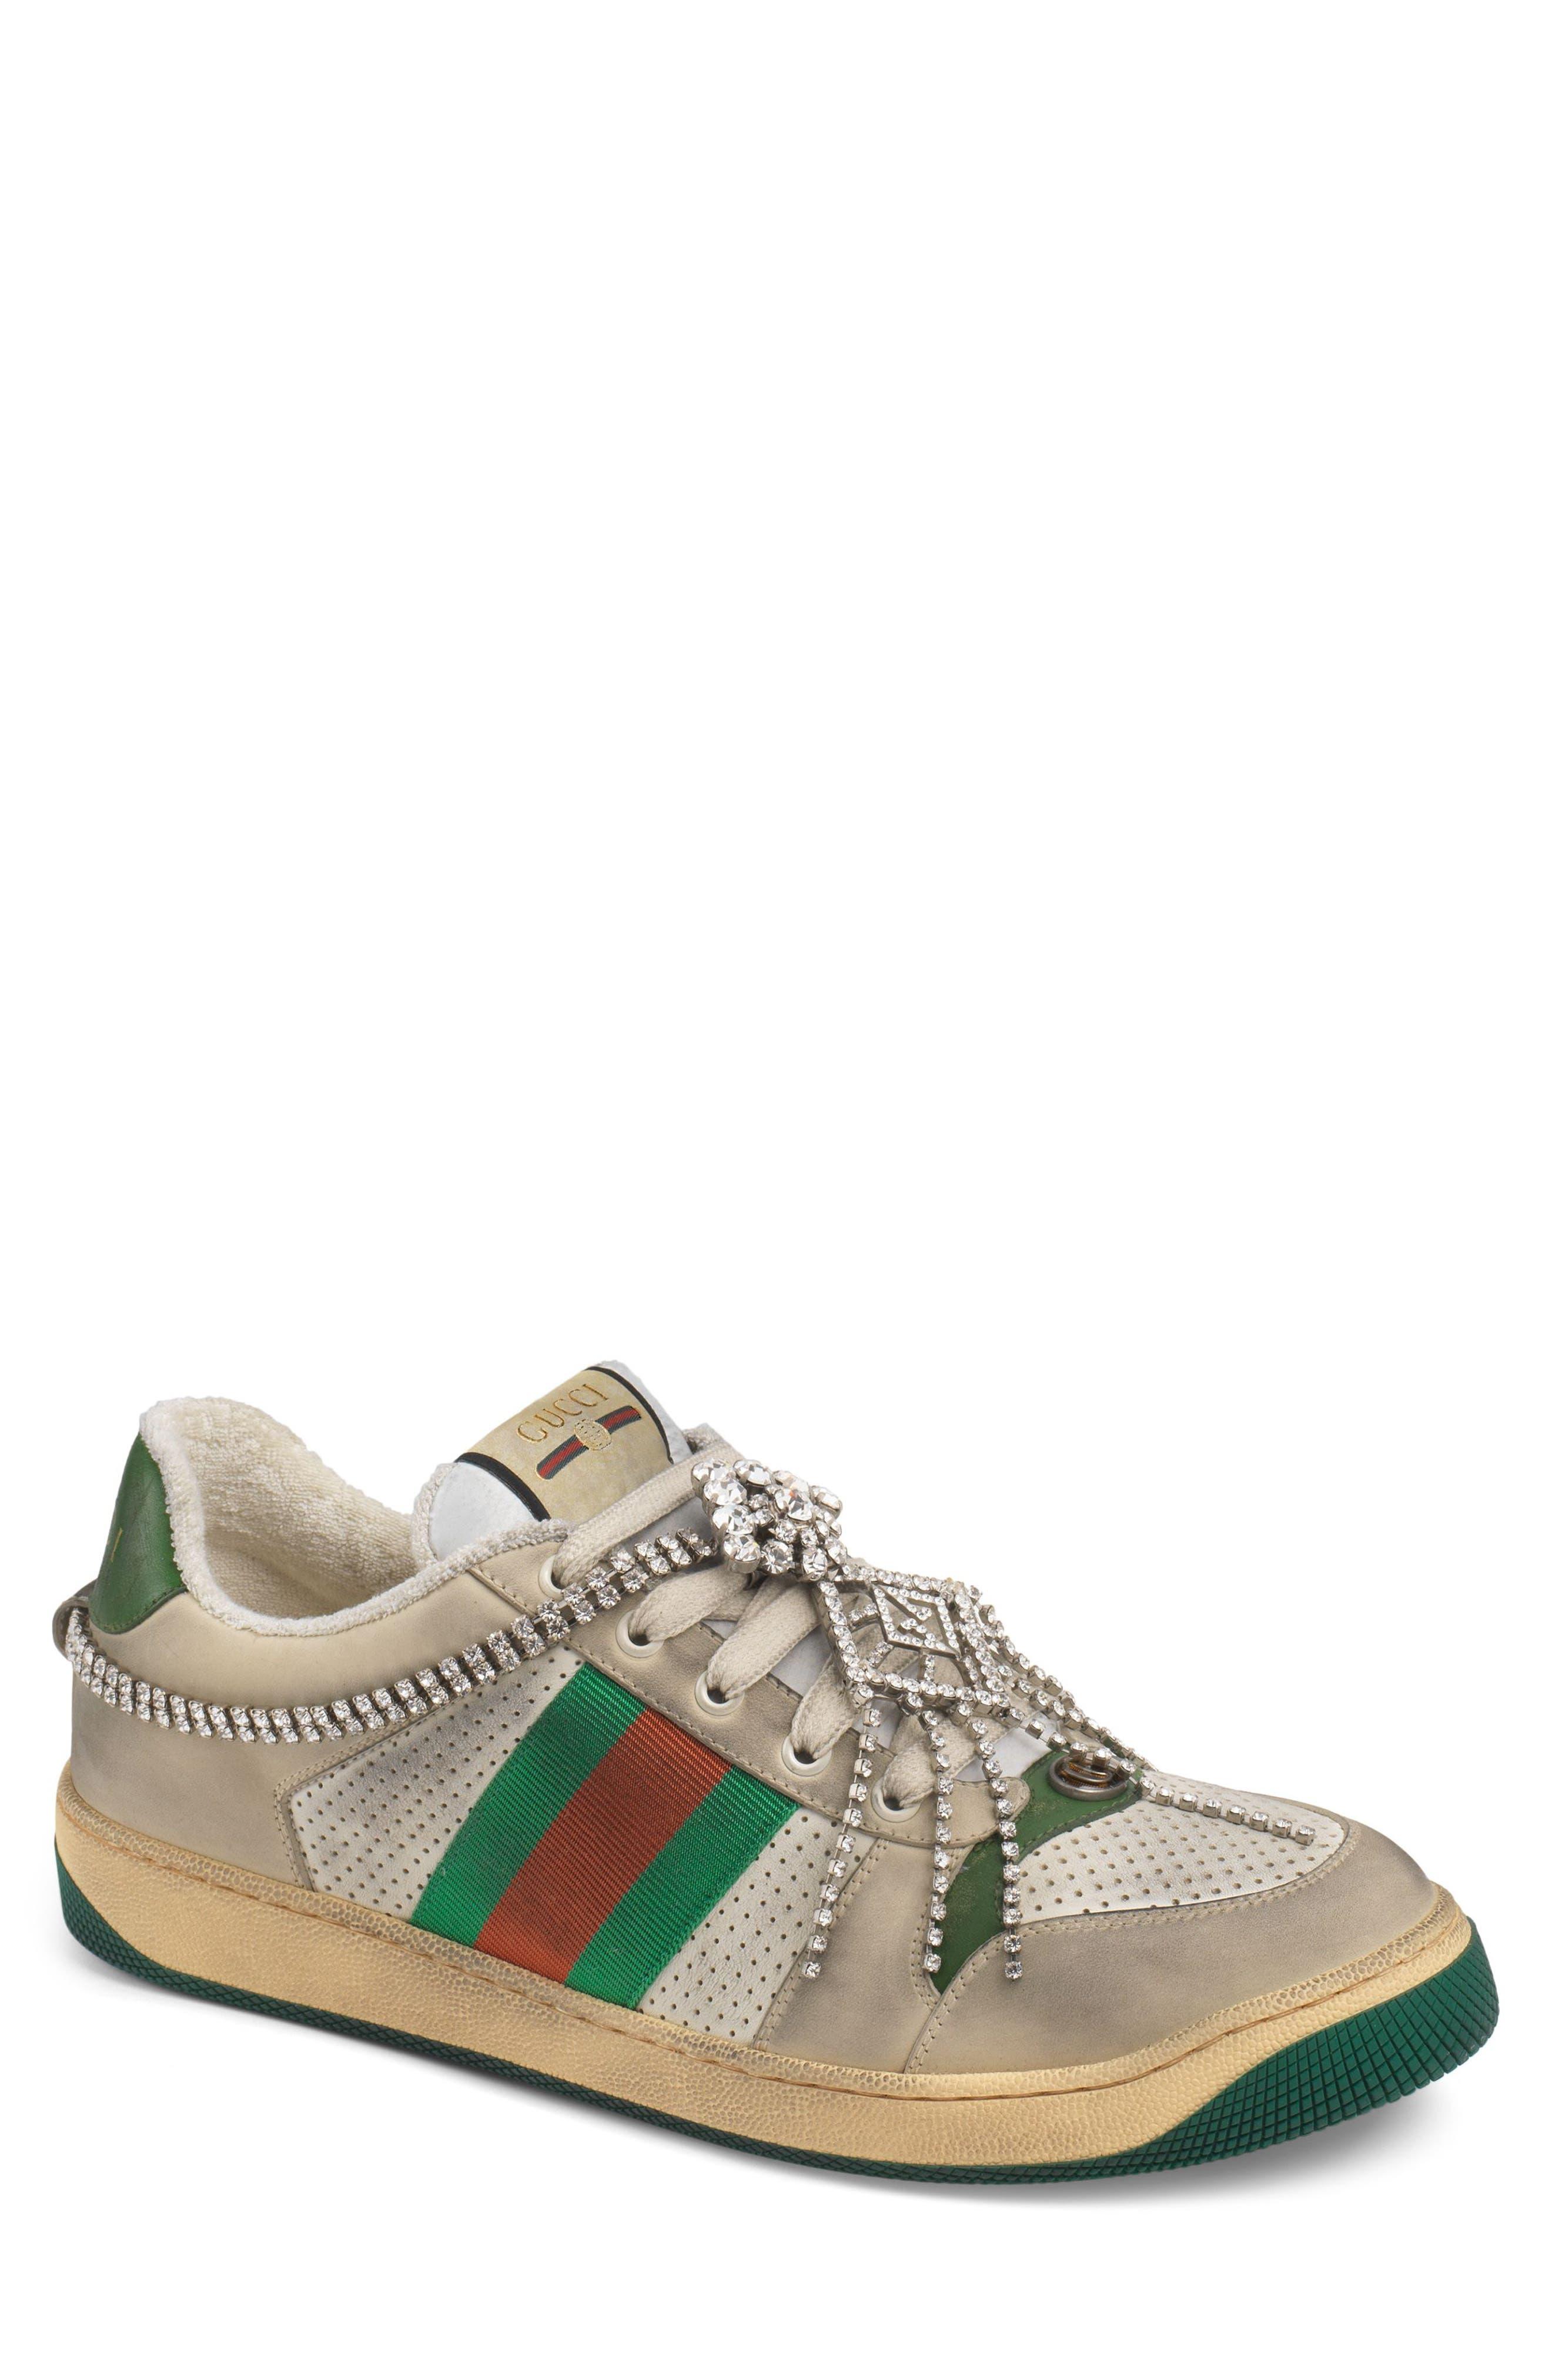 Screener Jewel Sneaker, Main, color, BEIGE/ GREEN/ RED